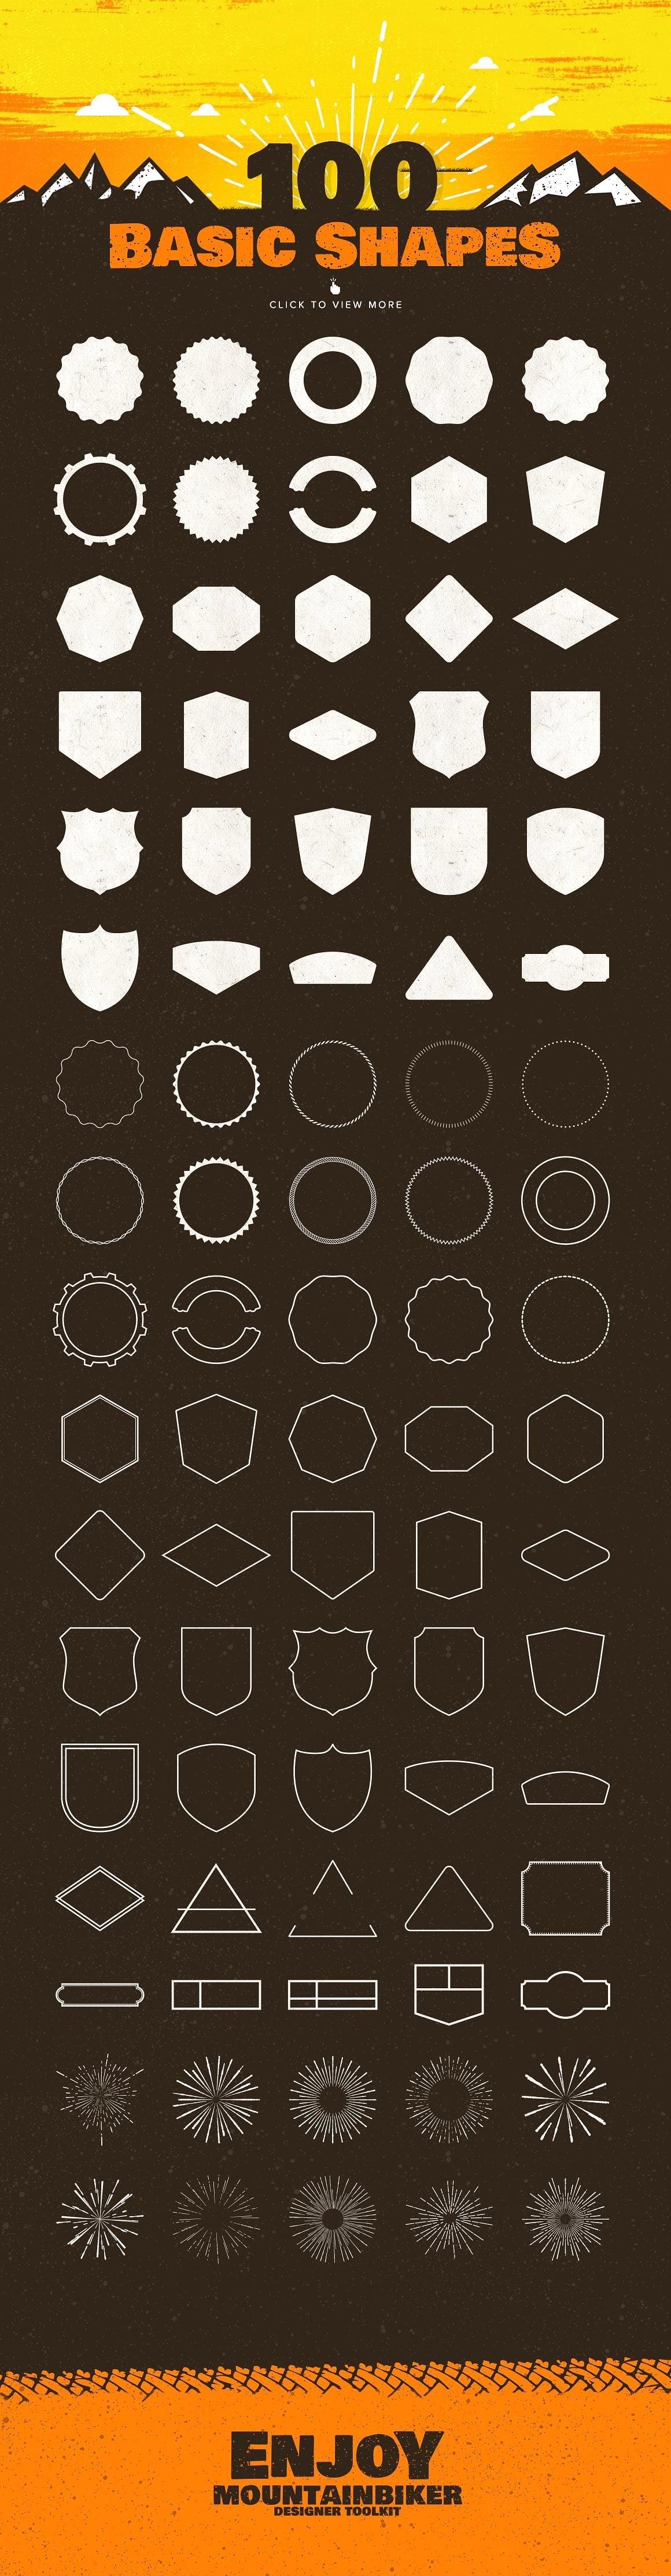 The Mountainbiker - Designer Logo Kit - 02 badges